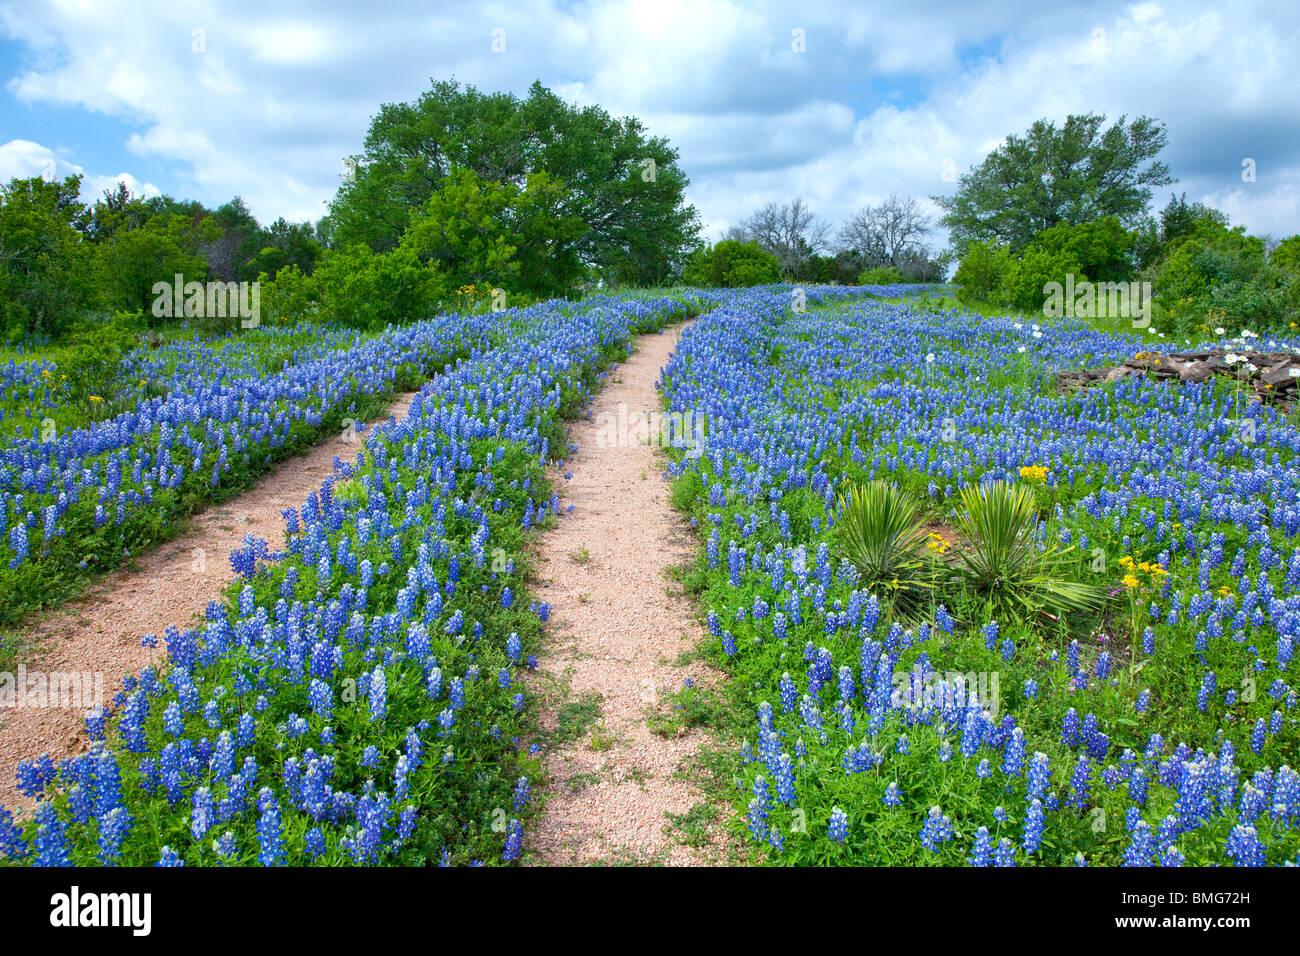 Double tracks through a field of Texas bluebonnets near Sandy, Texas. - Stock Image